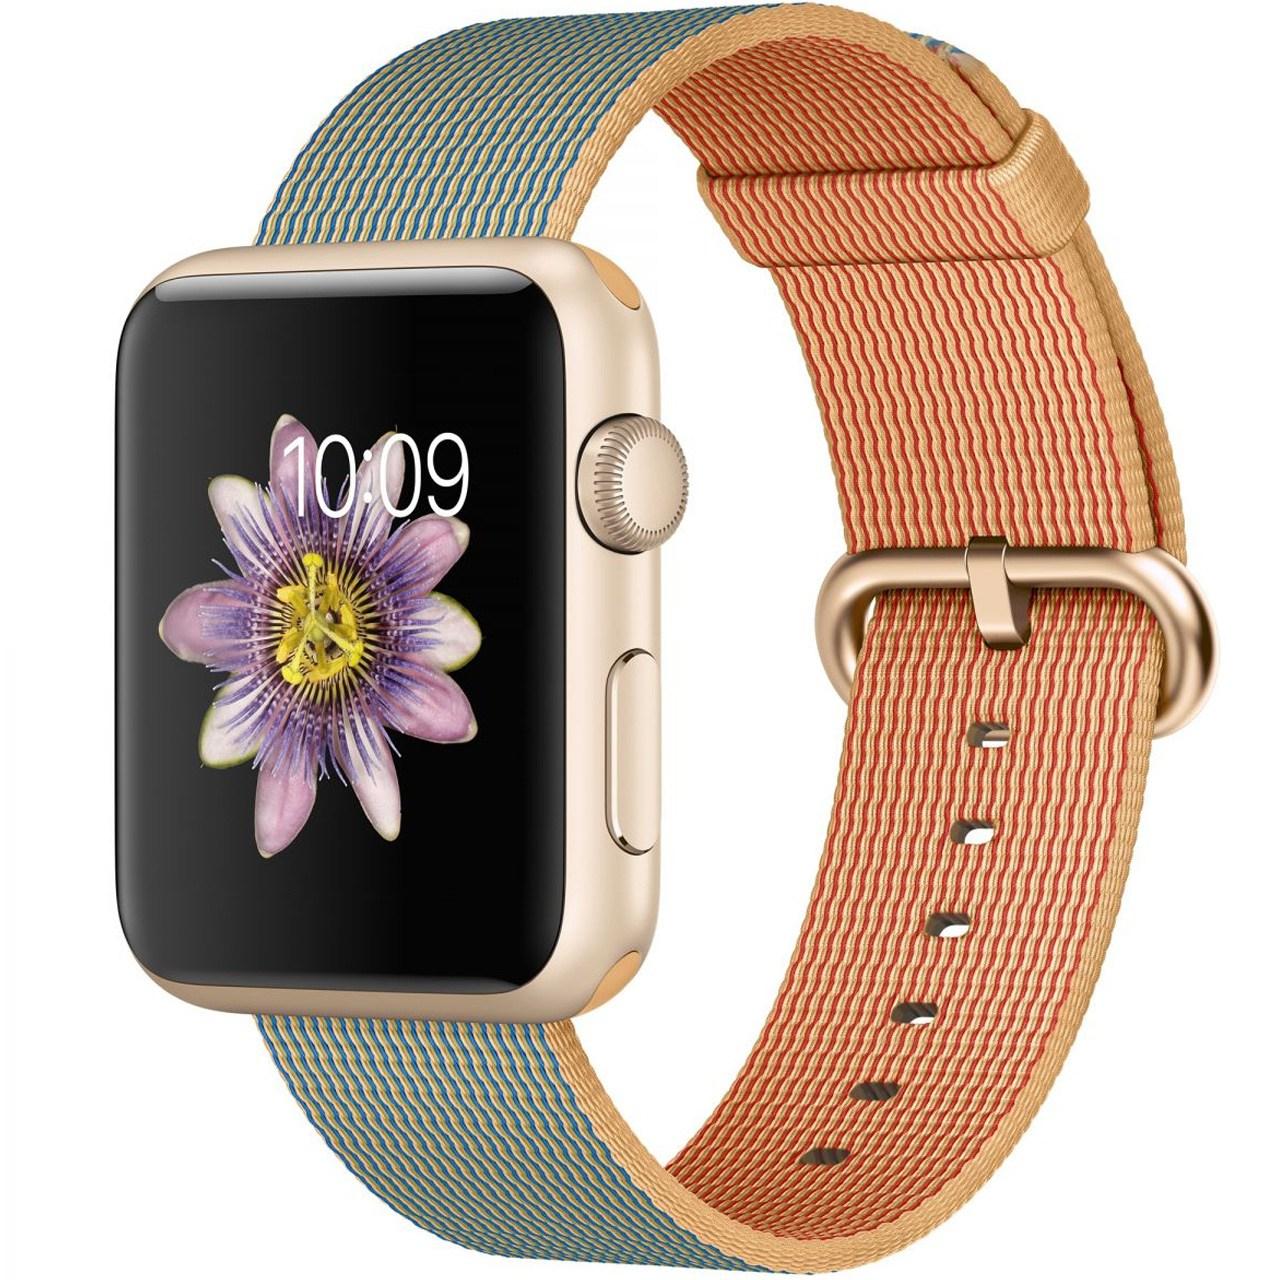 ساعت مچی هوشمند اپل واچ مدل 42mm Sport Gold Royal Blue Woven Nylon New